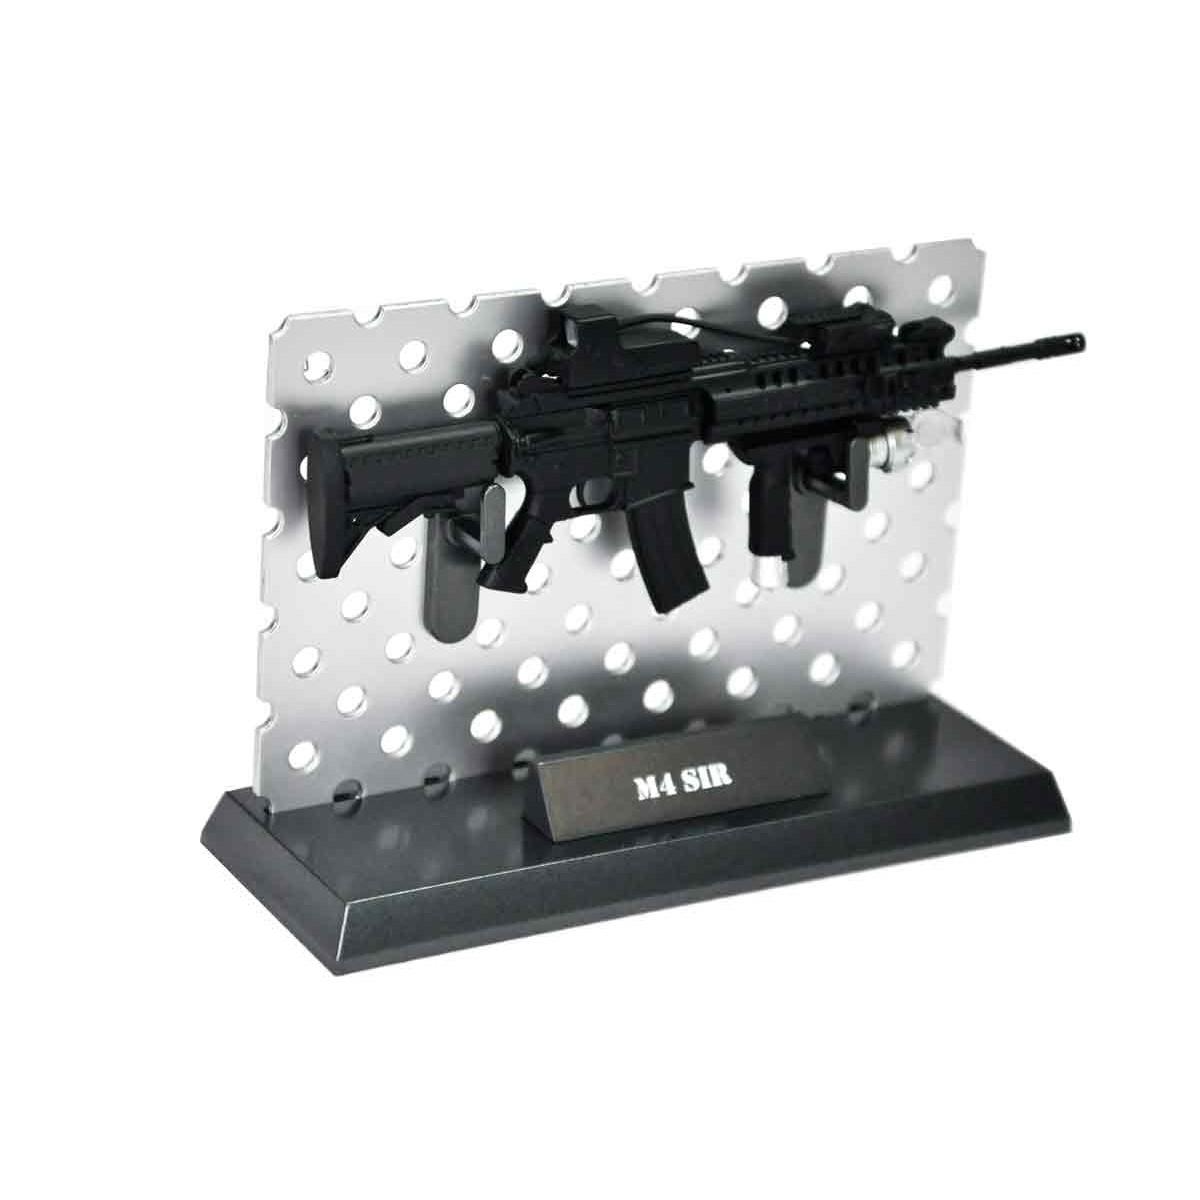 Miniatura Decorativa Rifle M4 SIR Arsenal Guns